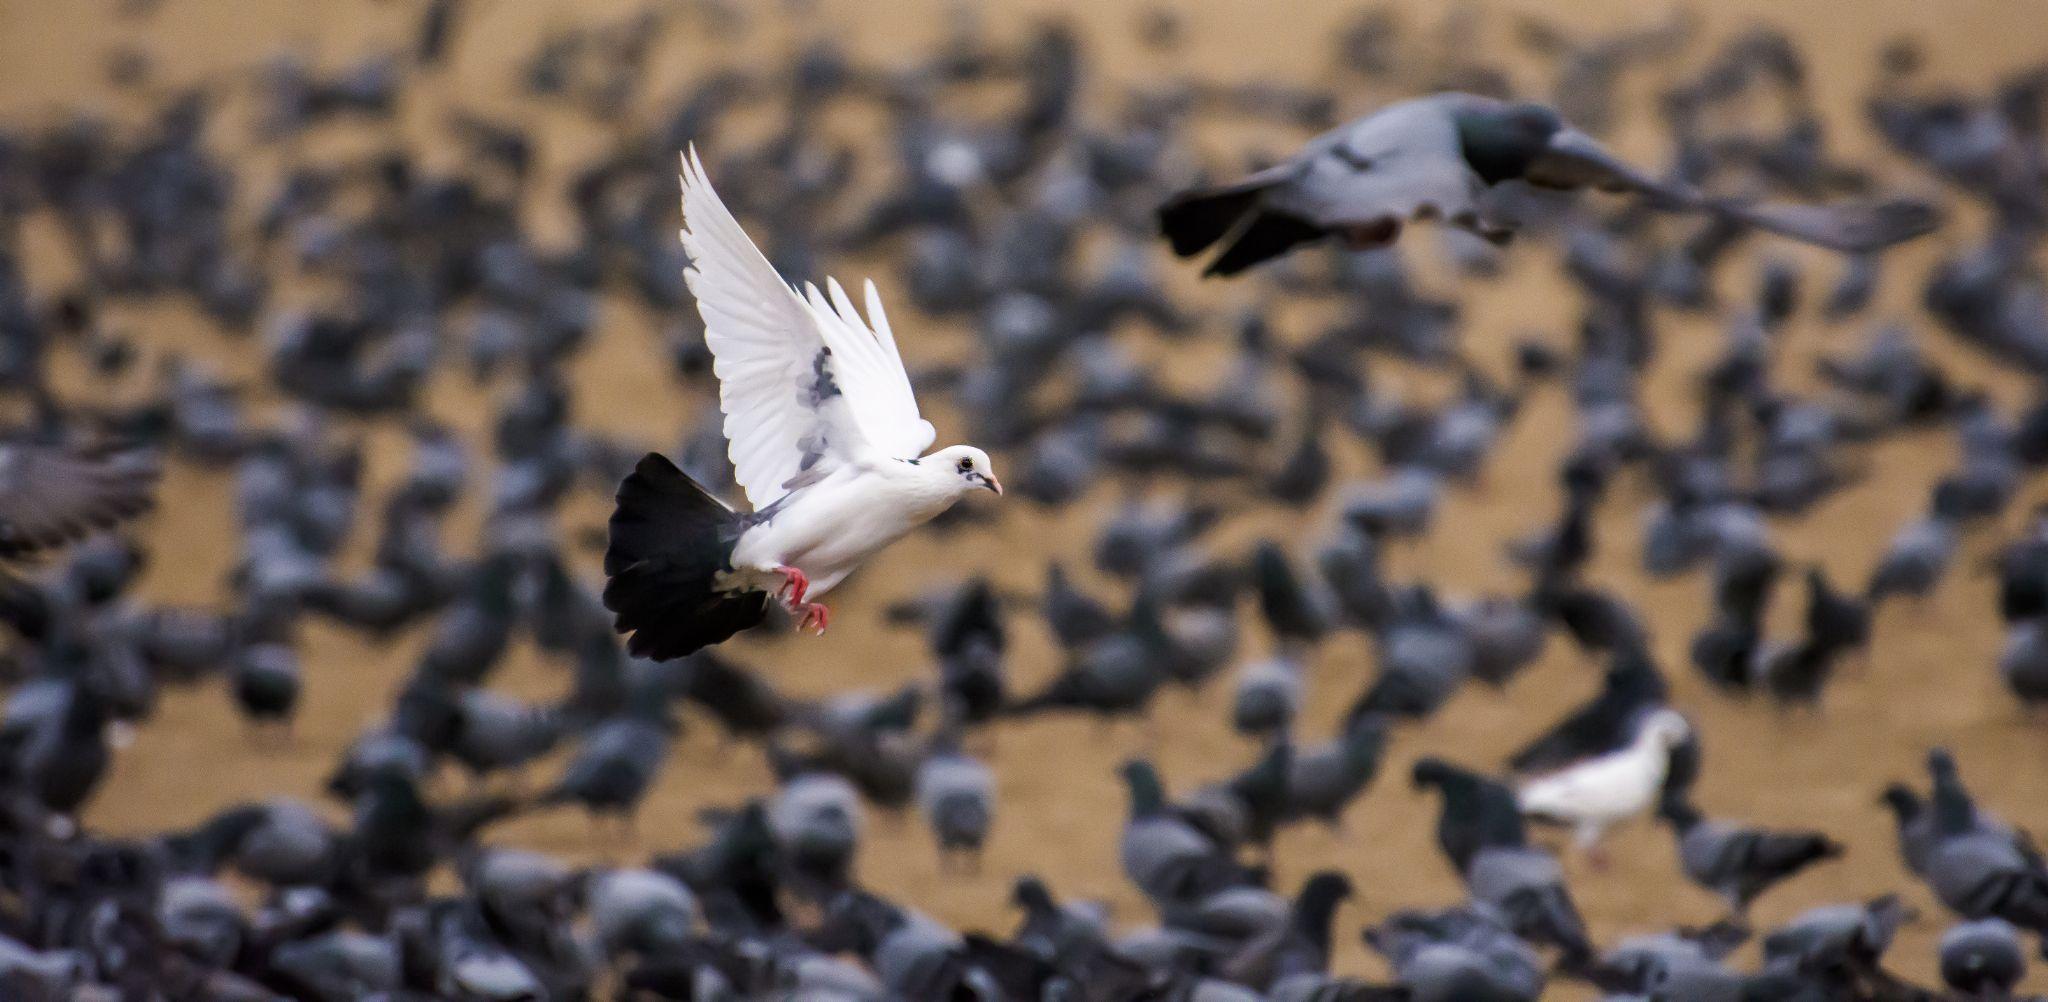 BIRD by sk.gupta.56